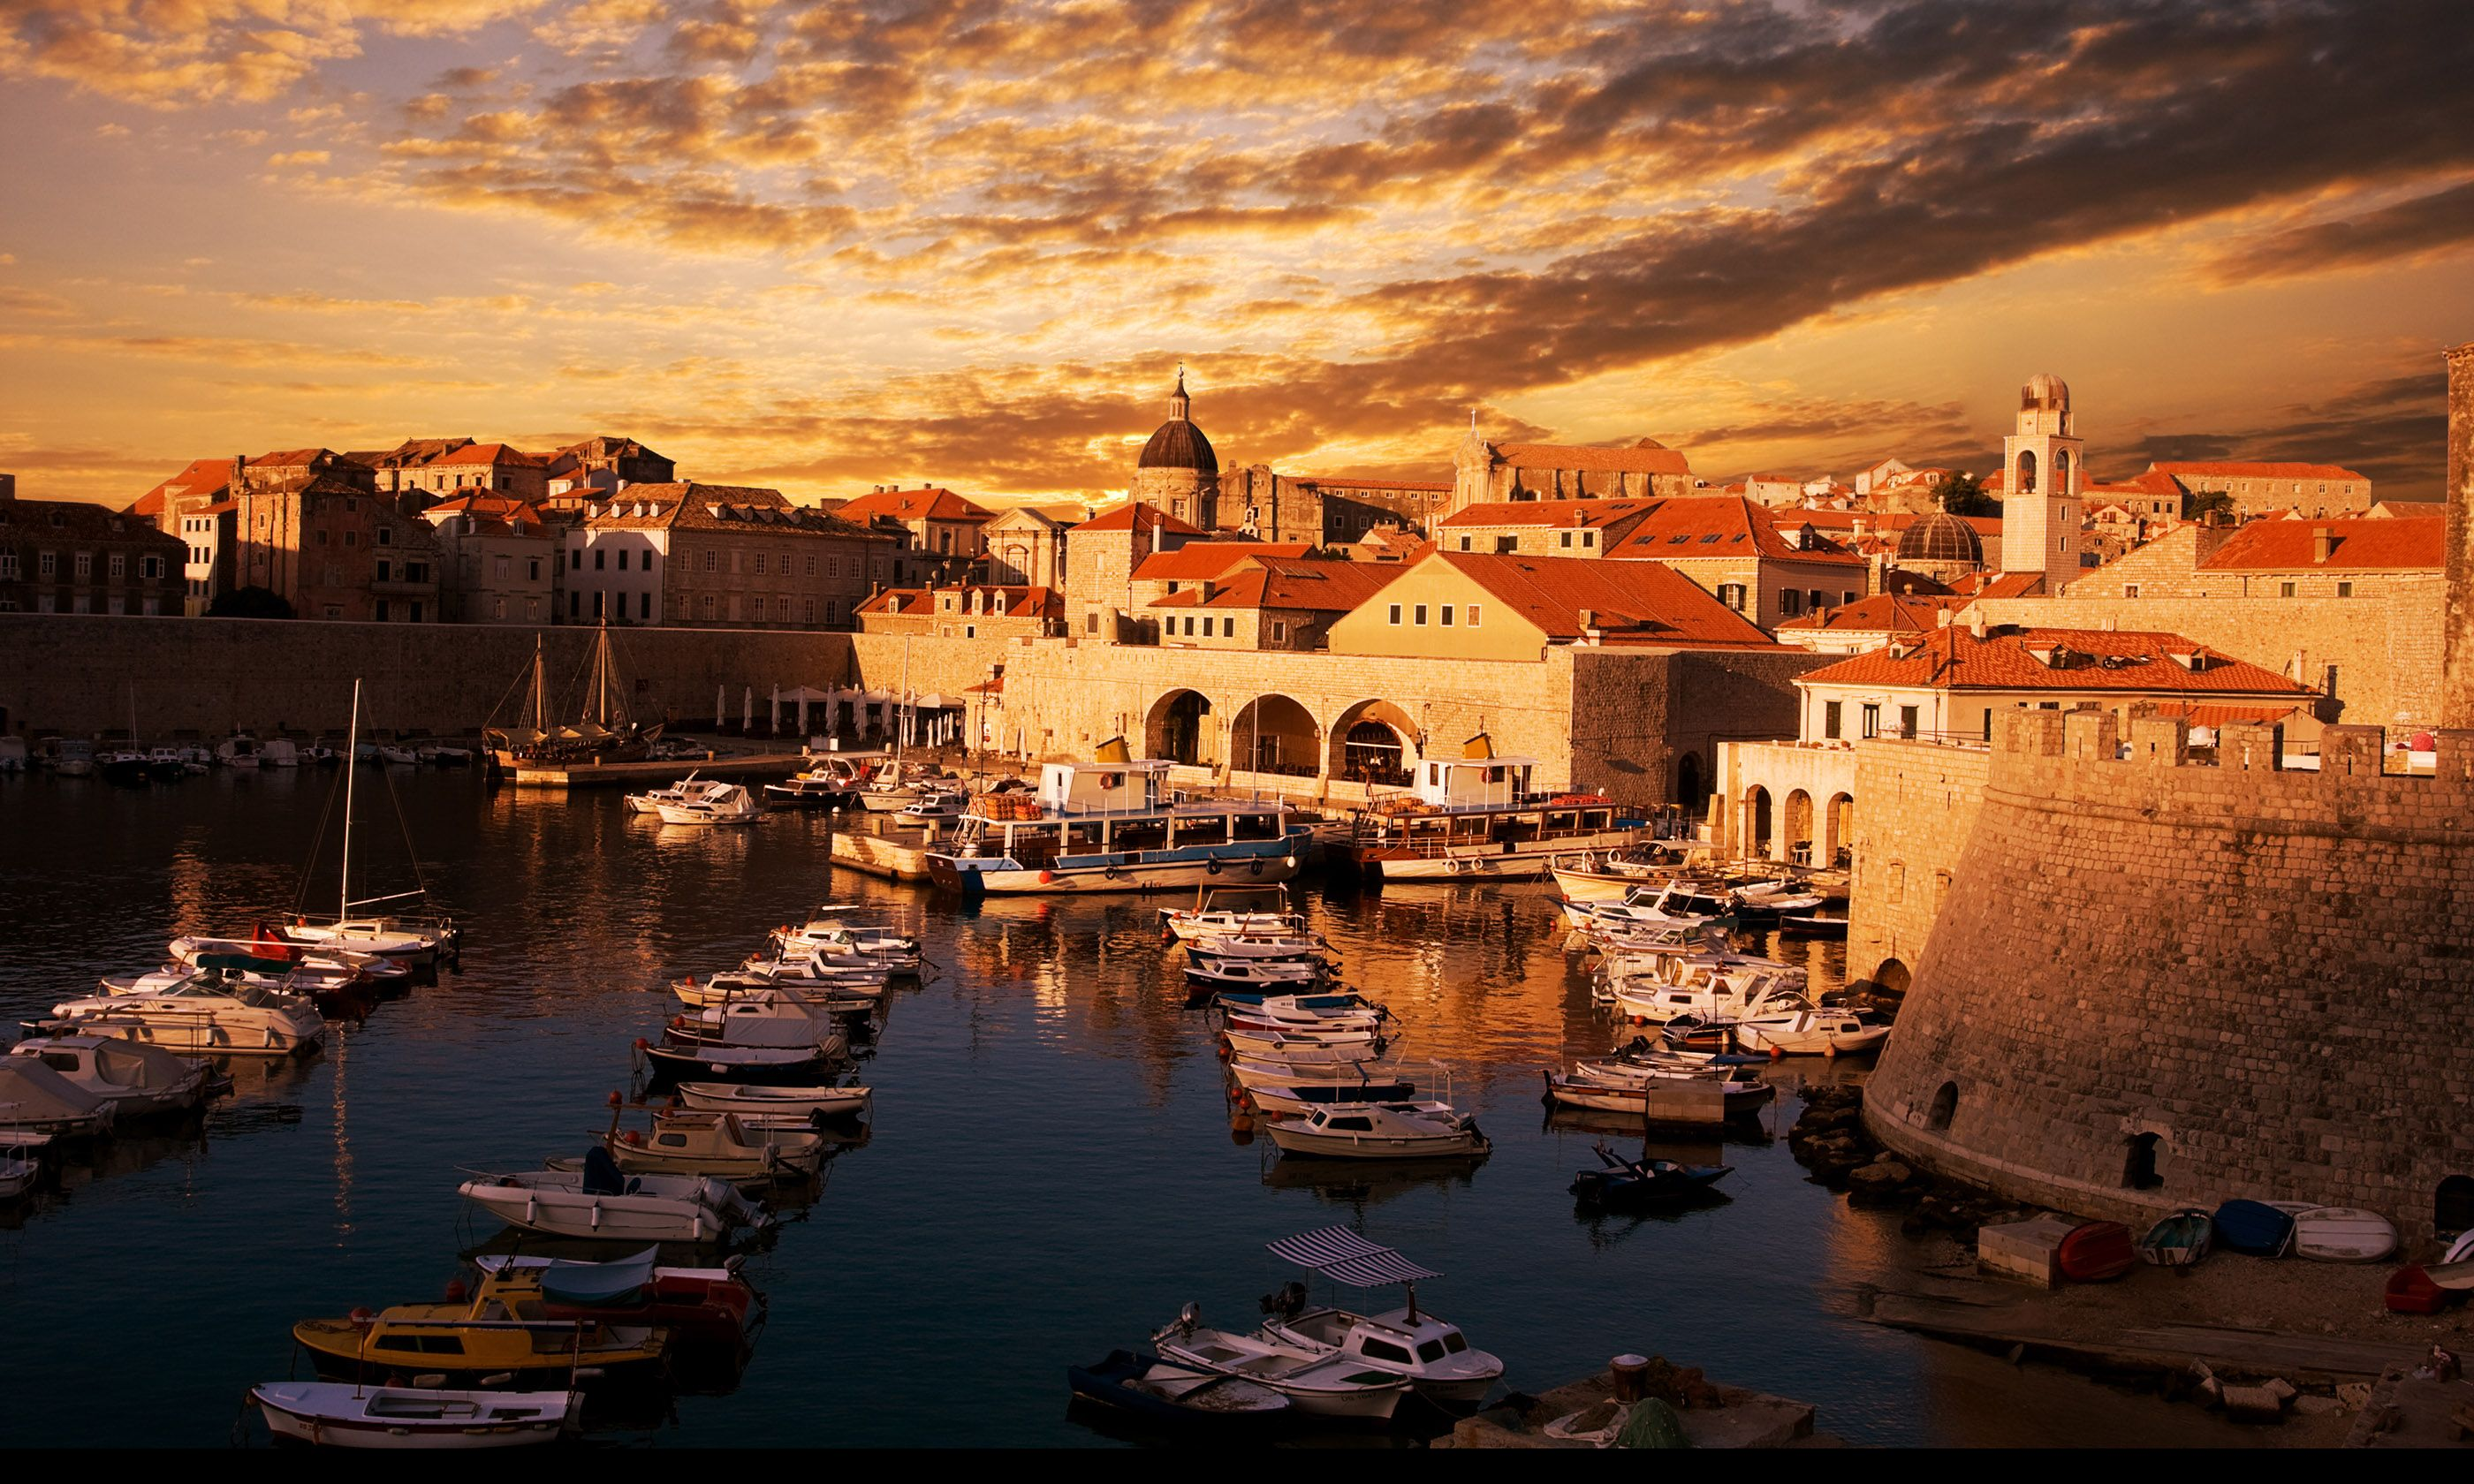 Dubrovnik at sunset (Shutterstock.com)